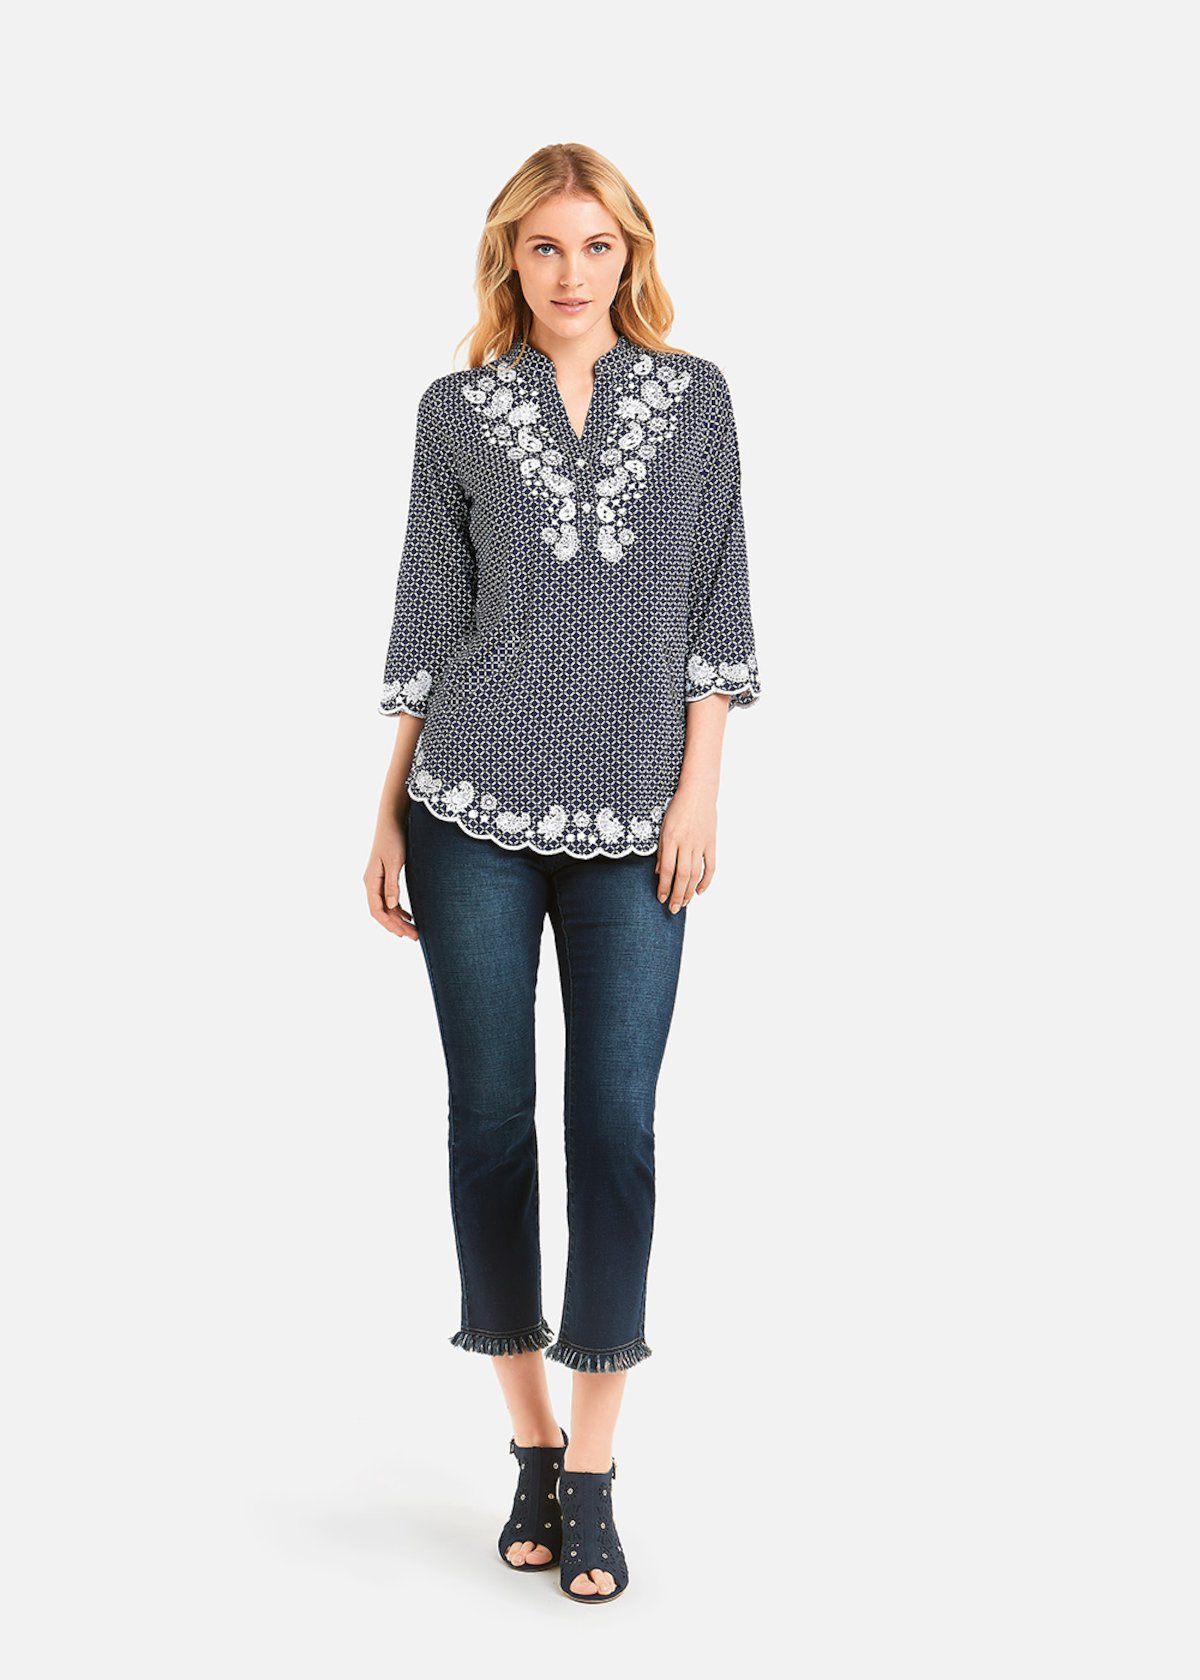 Crissy Shirt geometric pattern - Medium Blue / White Fantasia